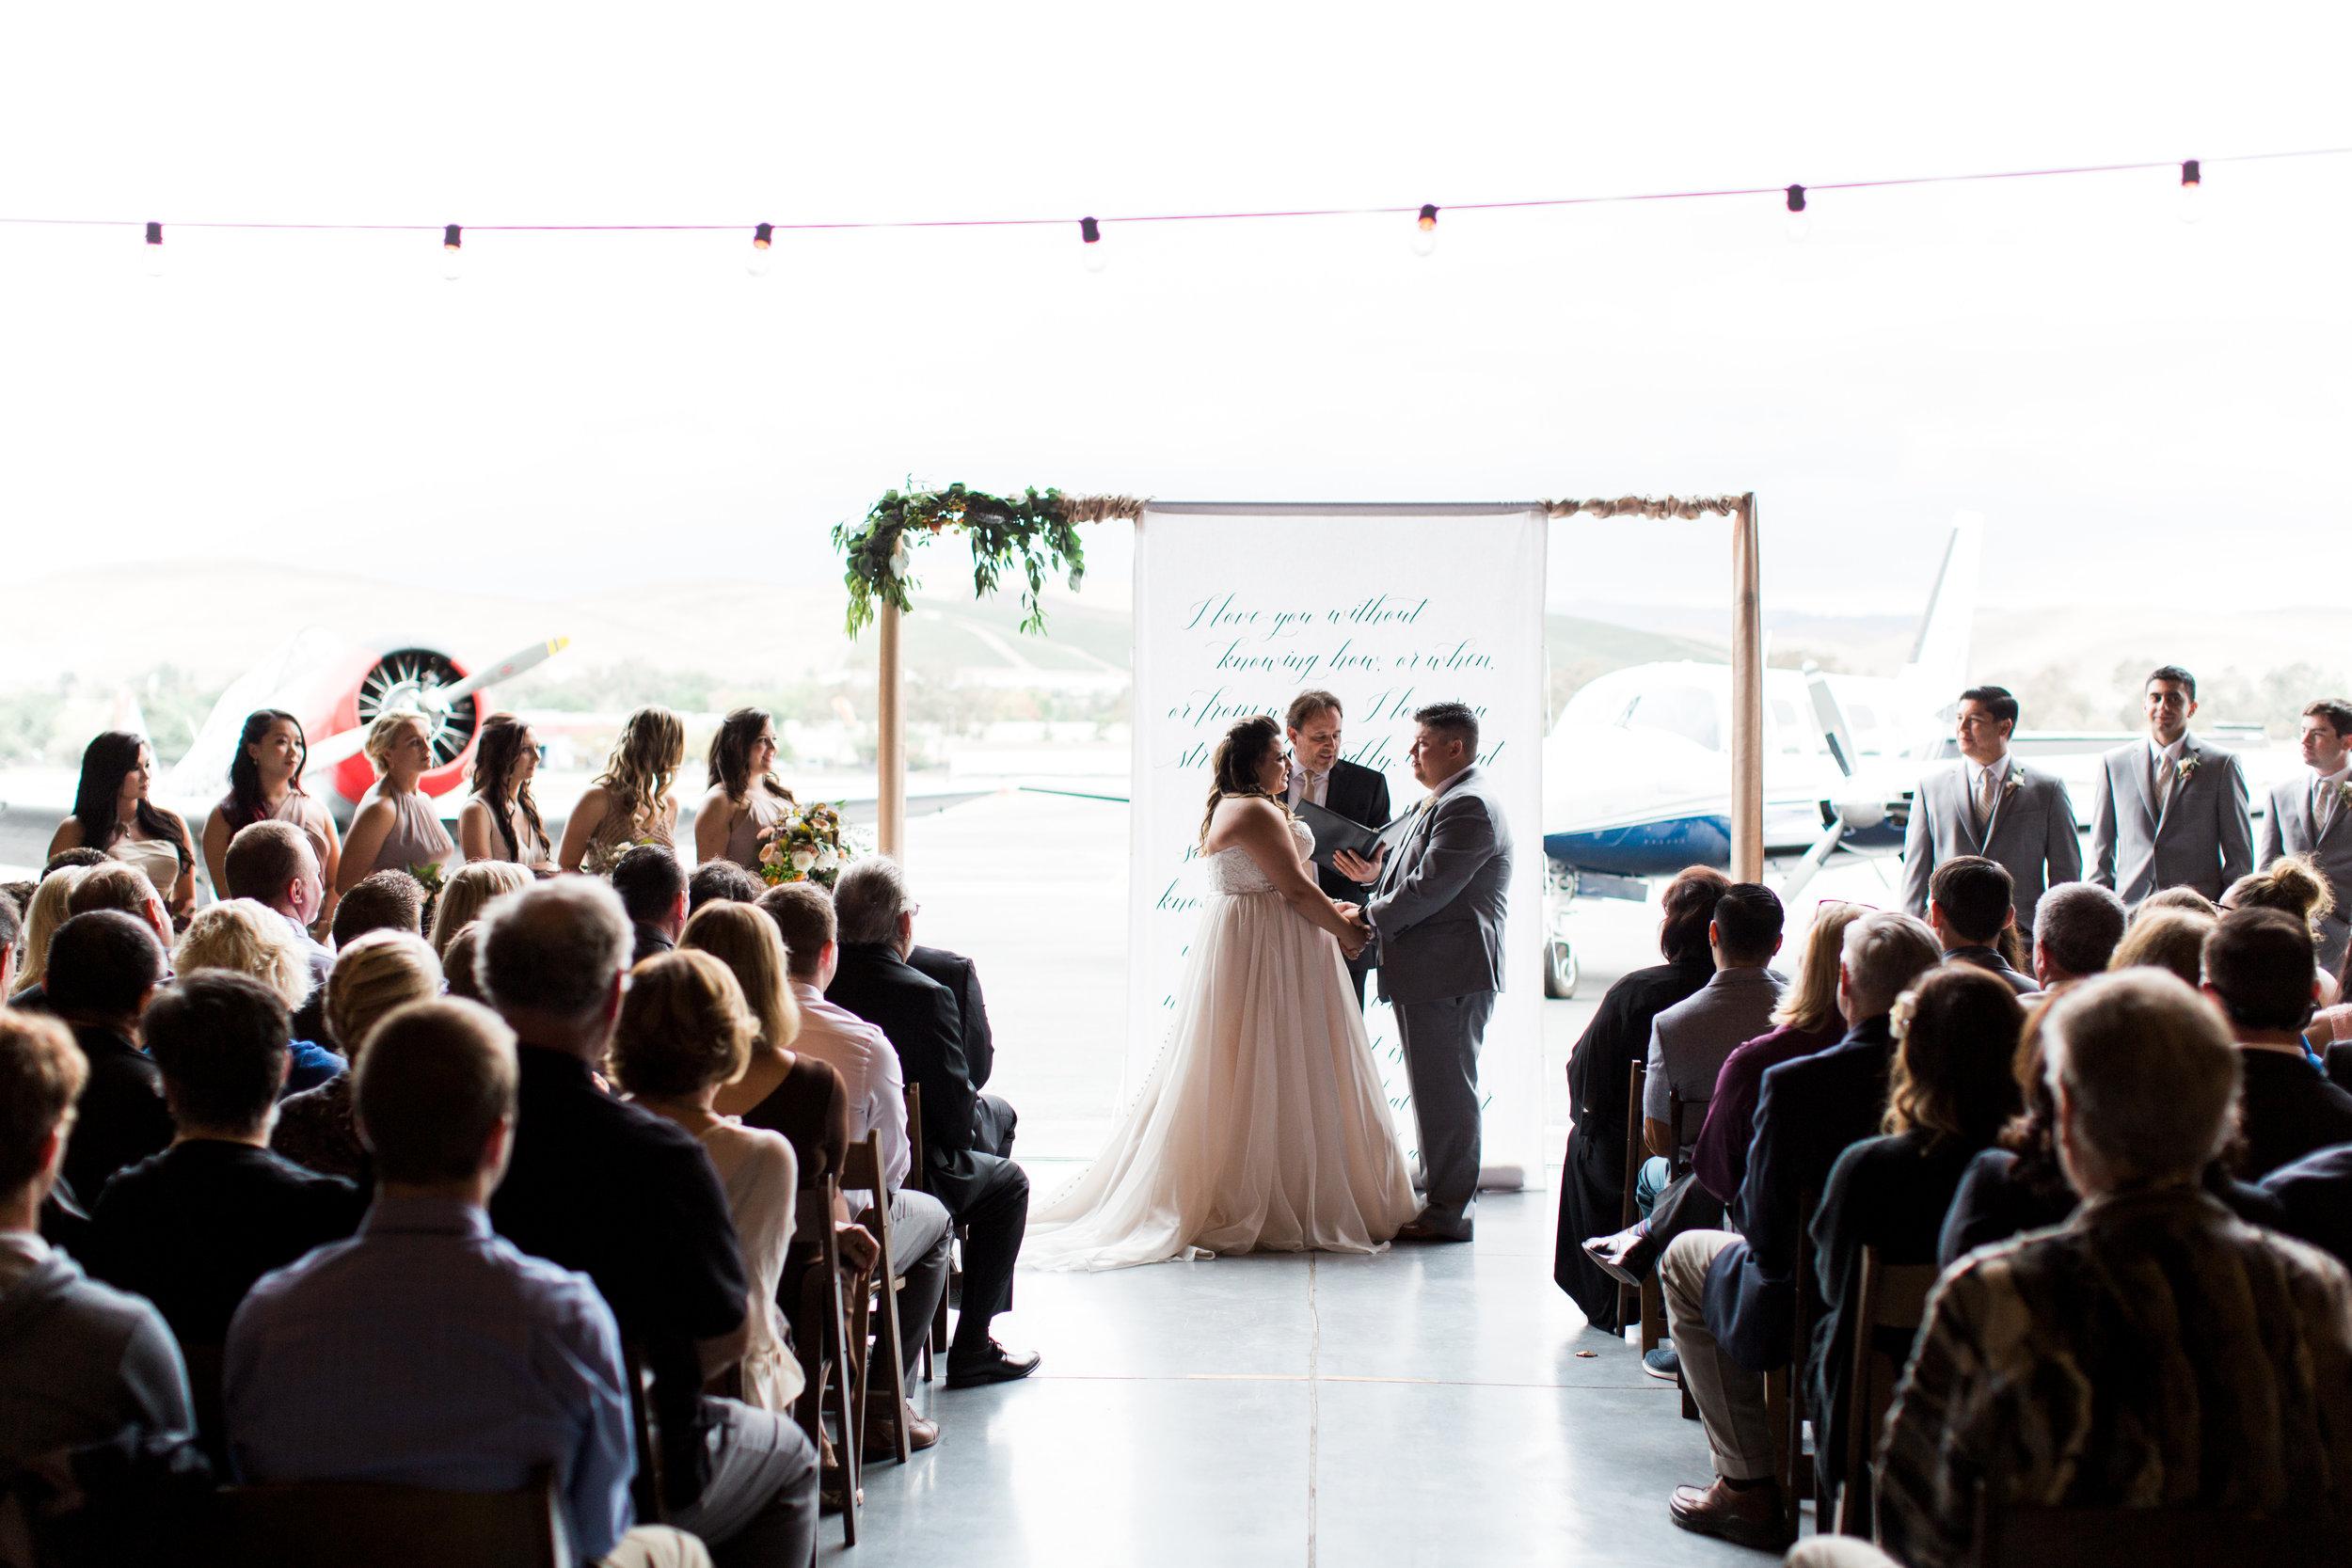 airport-hanger-wedding-at-attitude-aviation-in-livermore-57.jpg